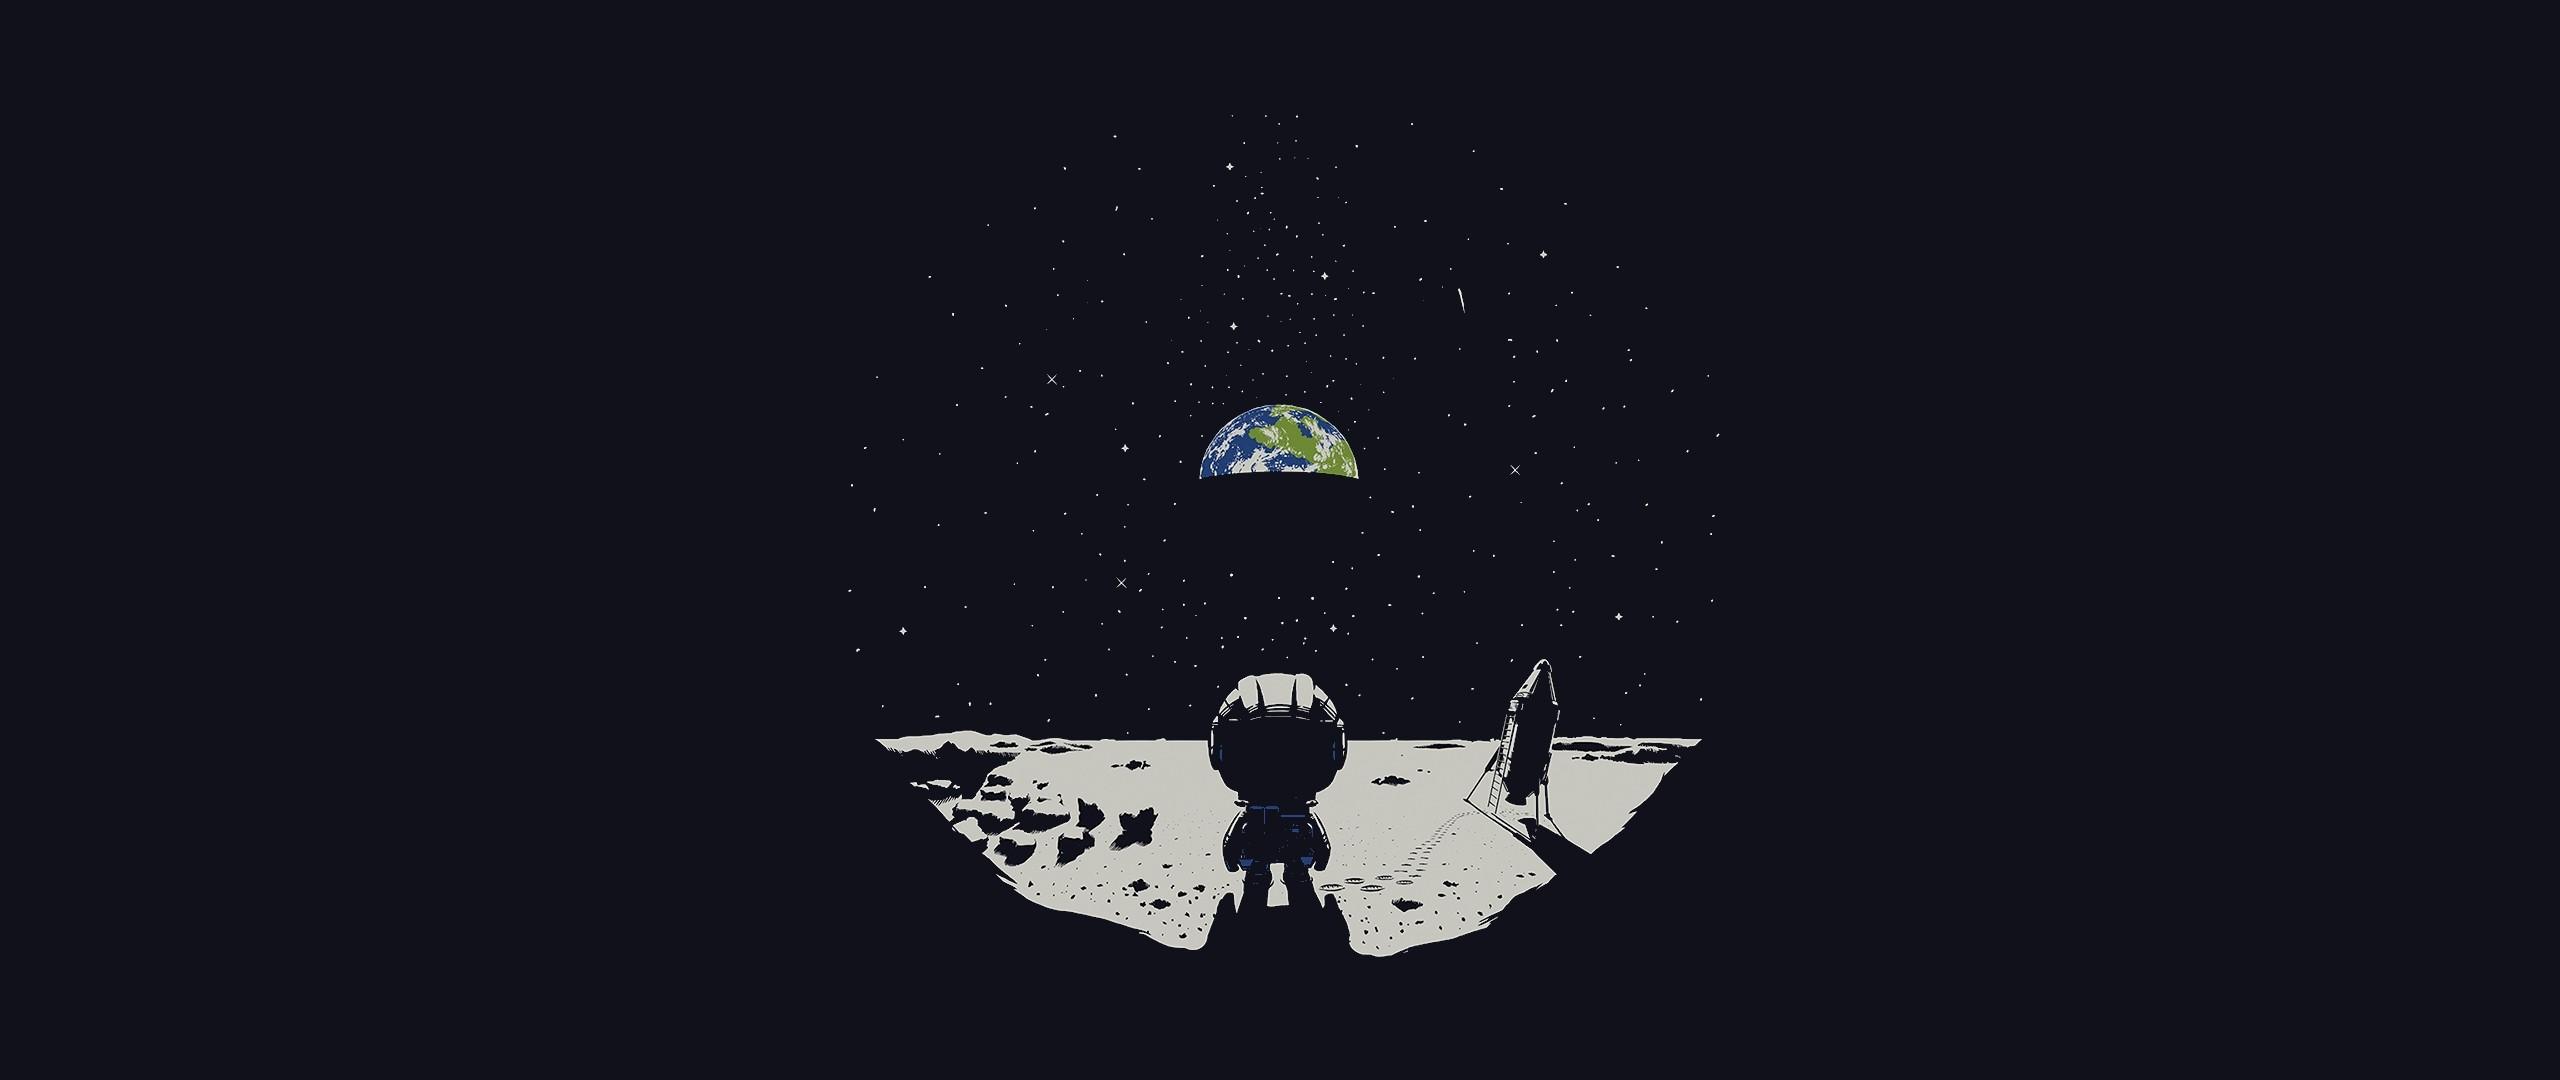 Wallpaper illustration space earth logo moon - Wallpaper kerbal space program ...